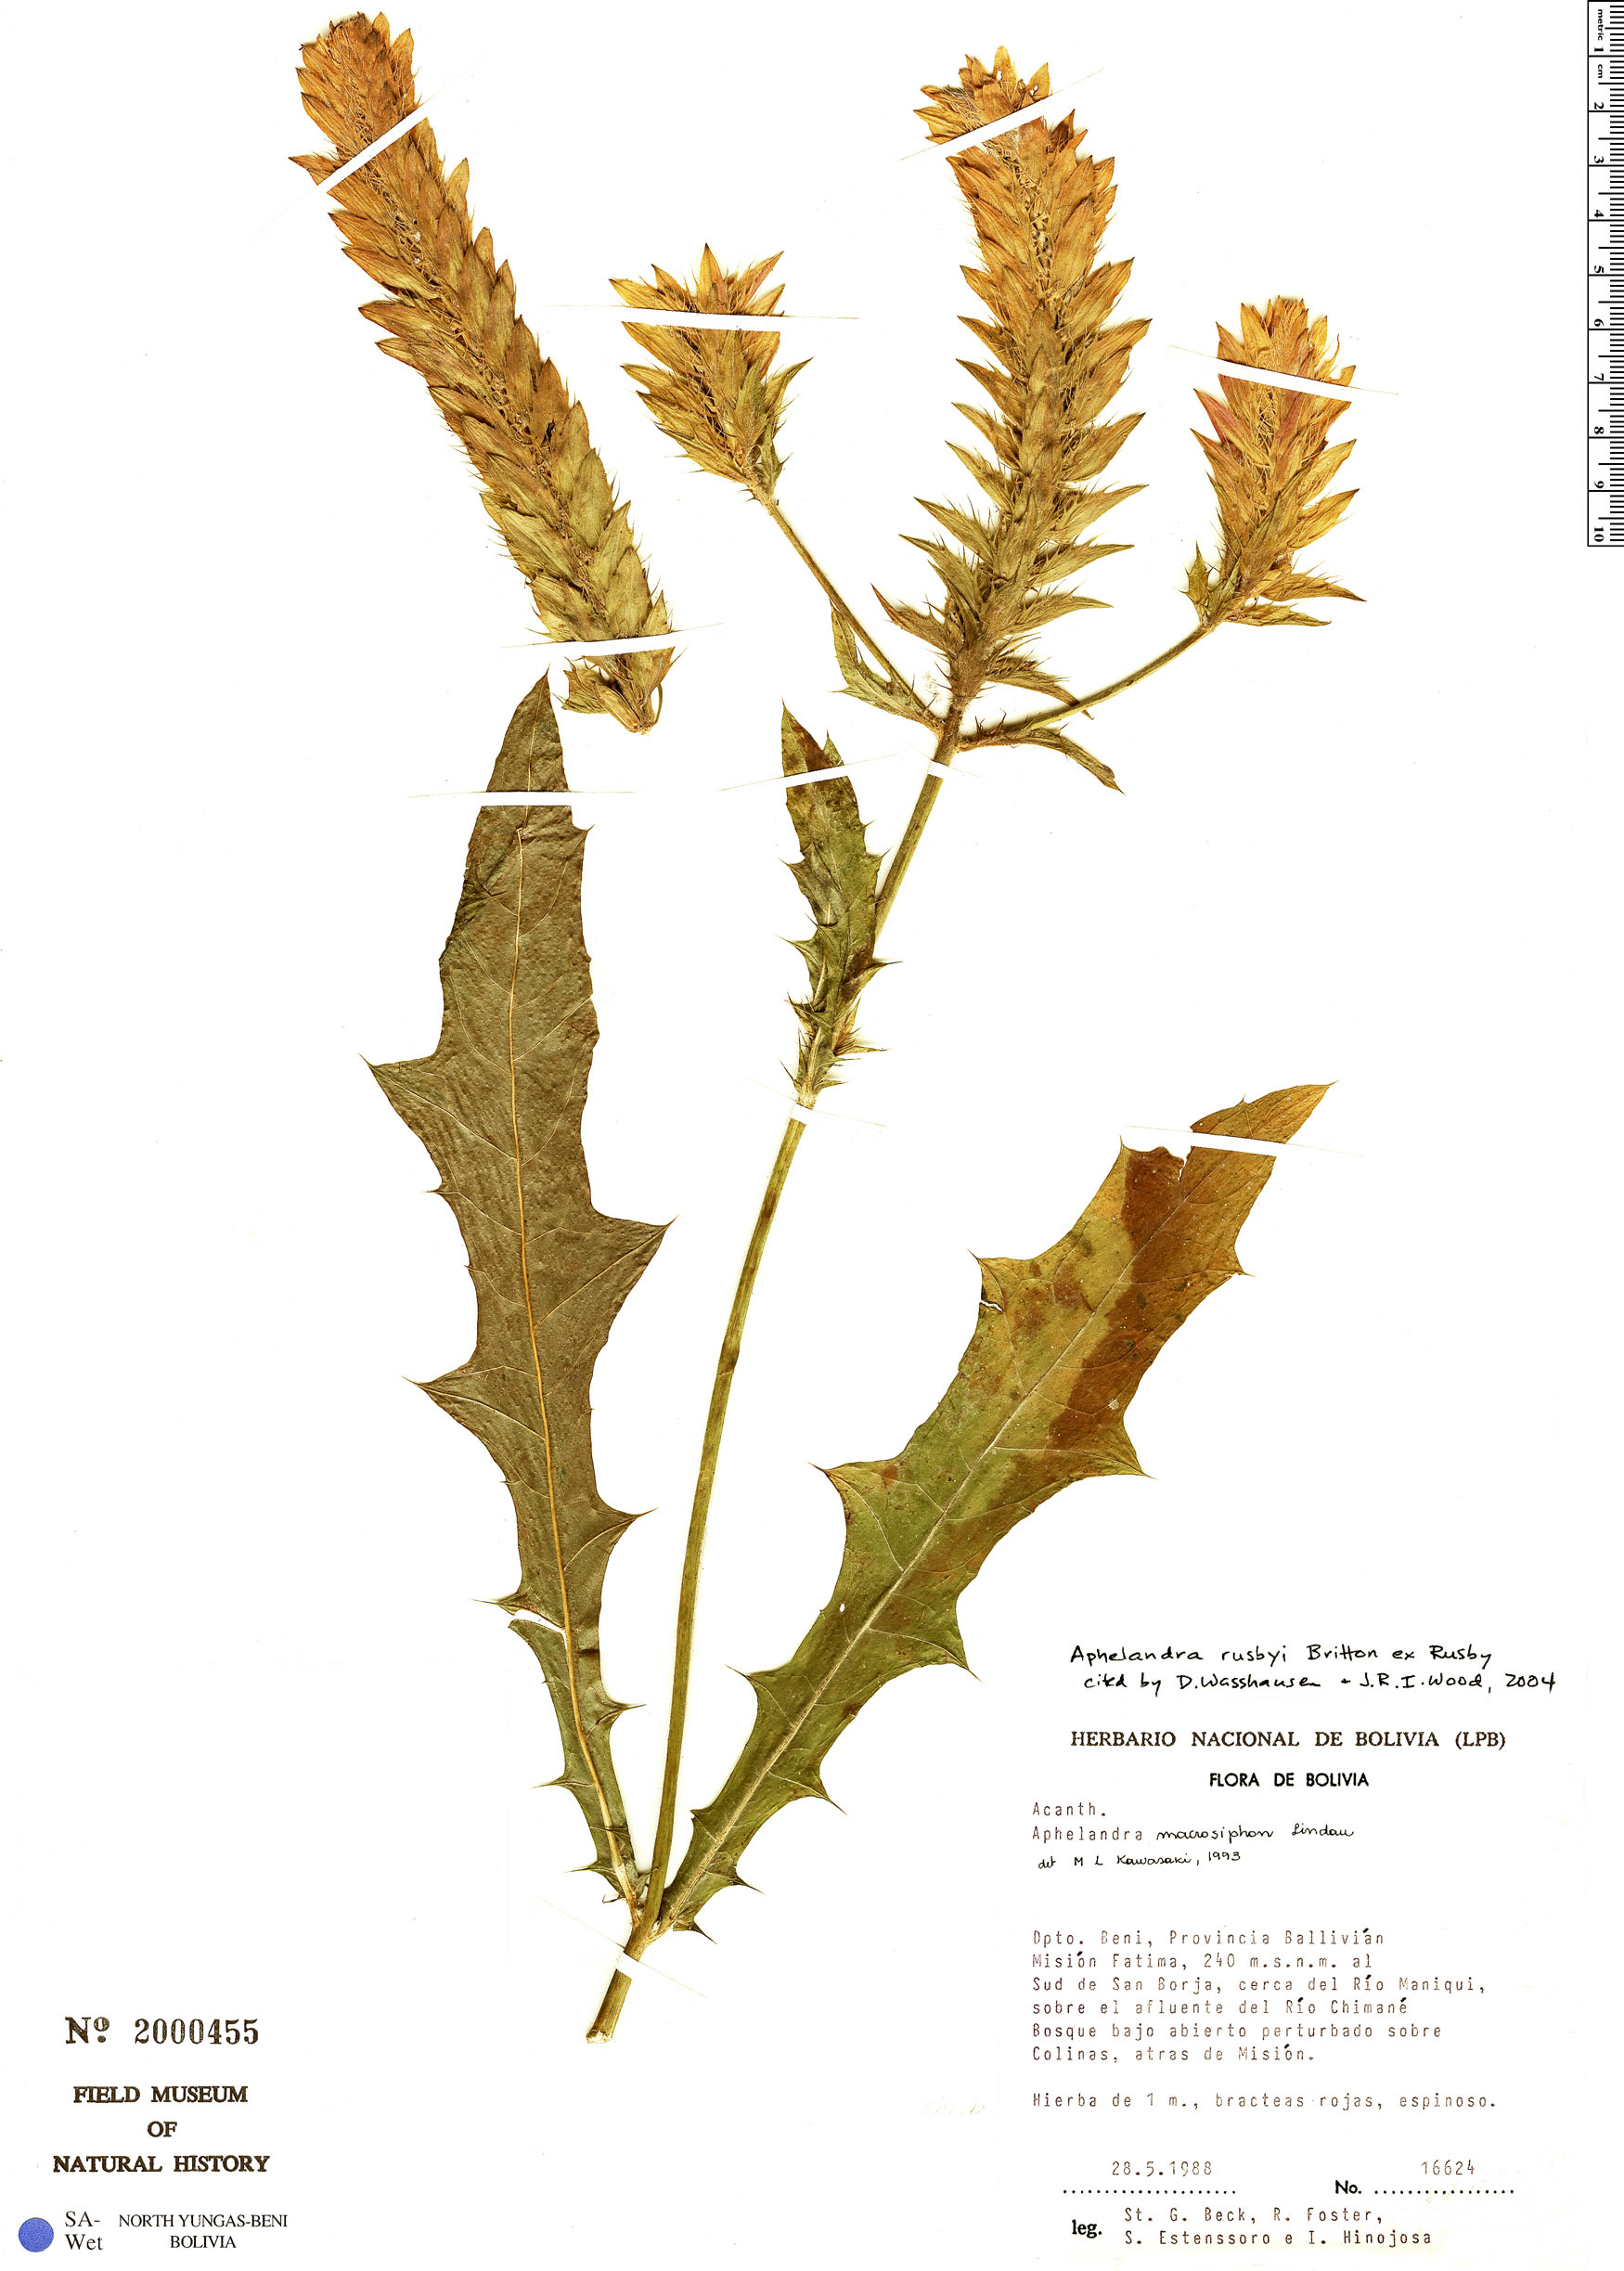 Specimen: Aphelandra rusbyi